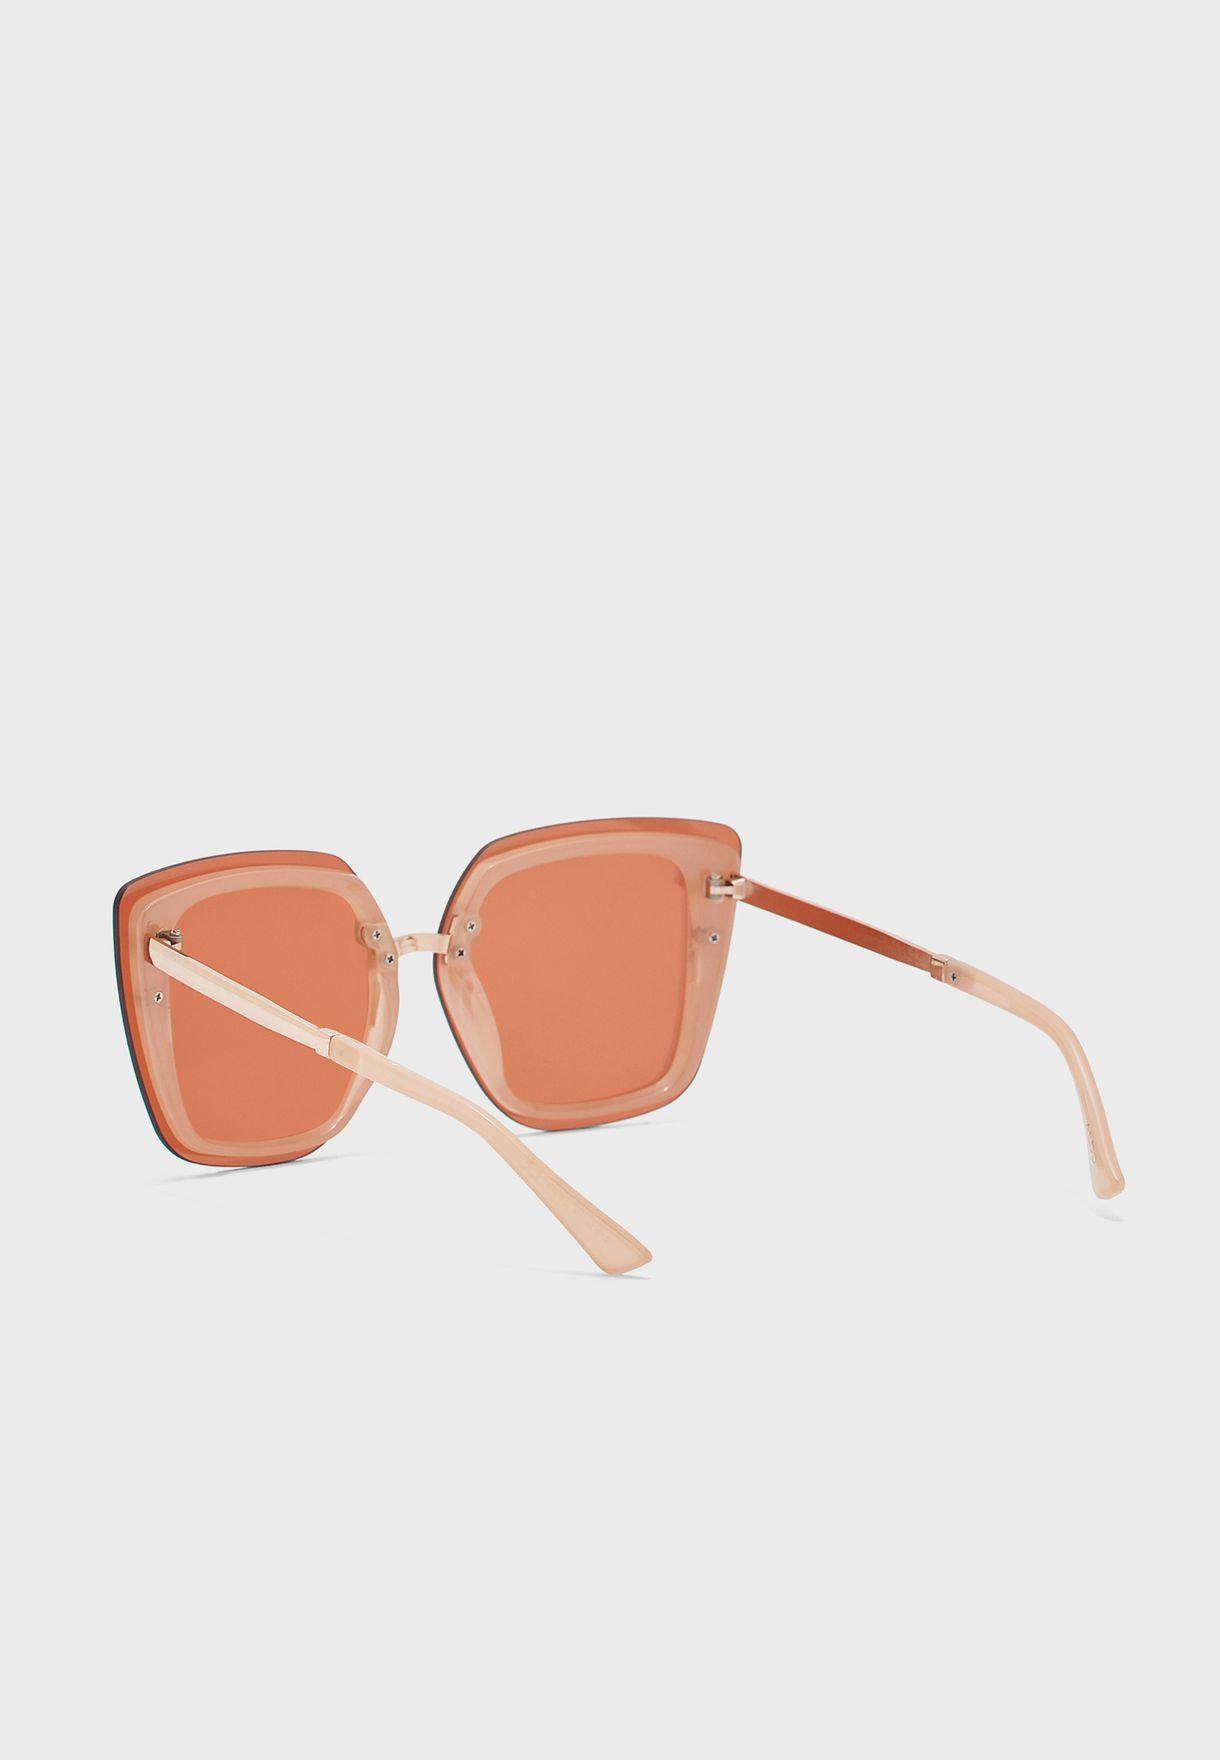 Jugla Oversized Sunglasses